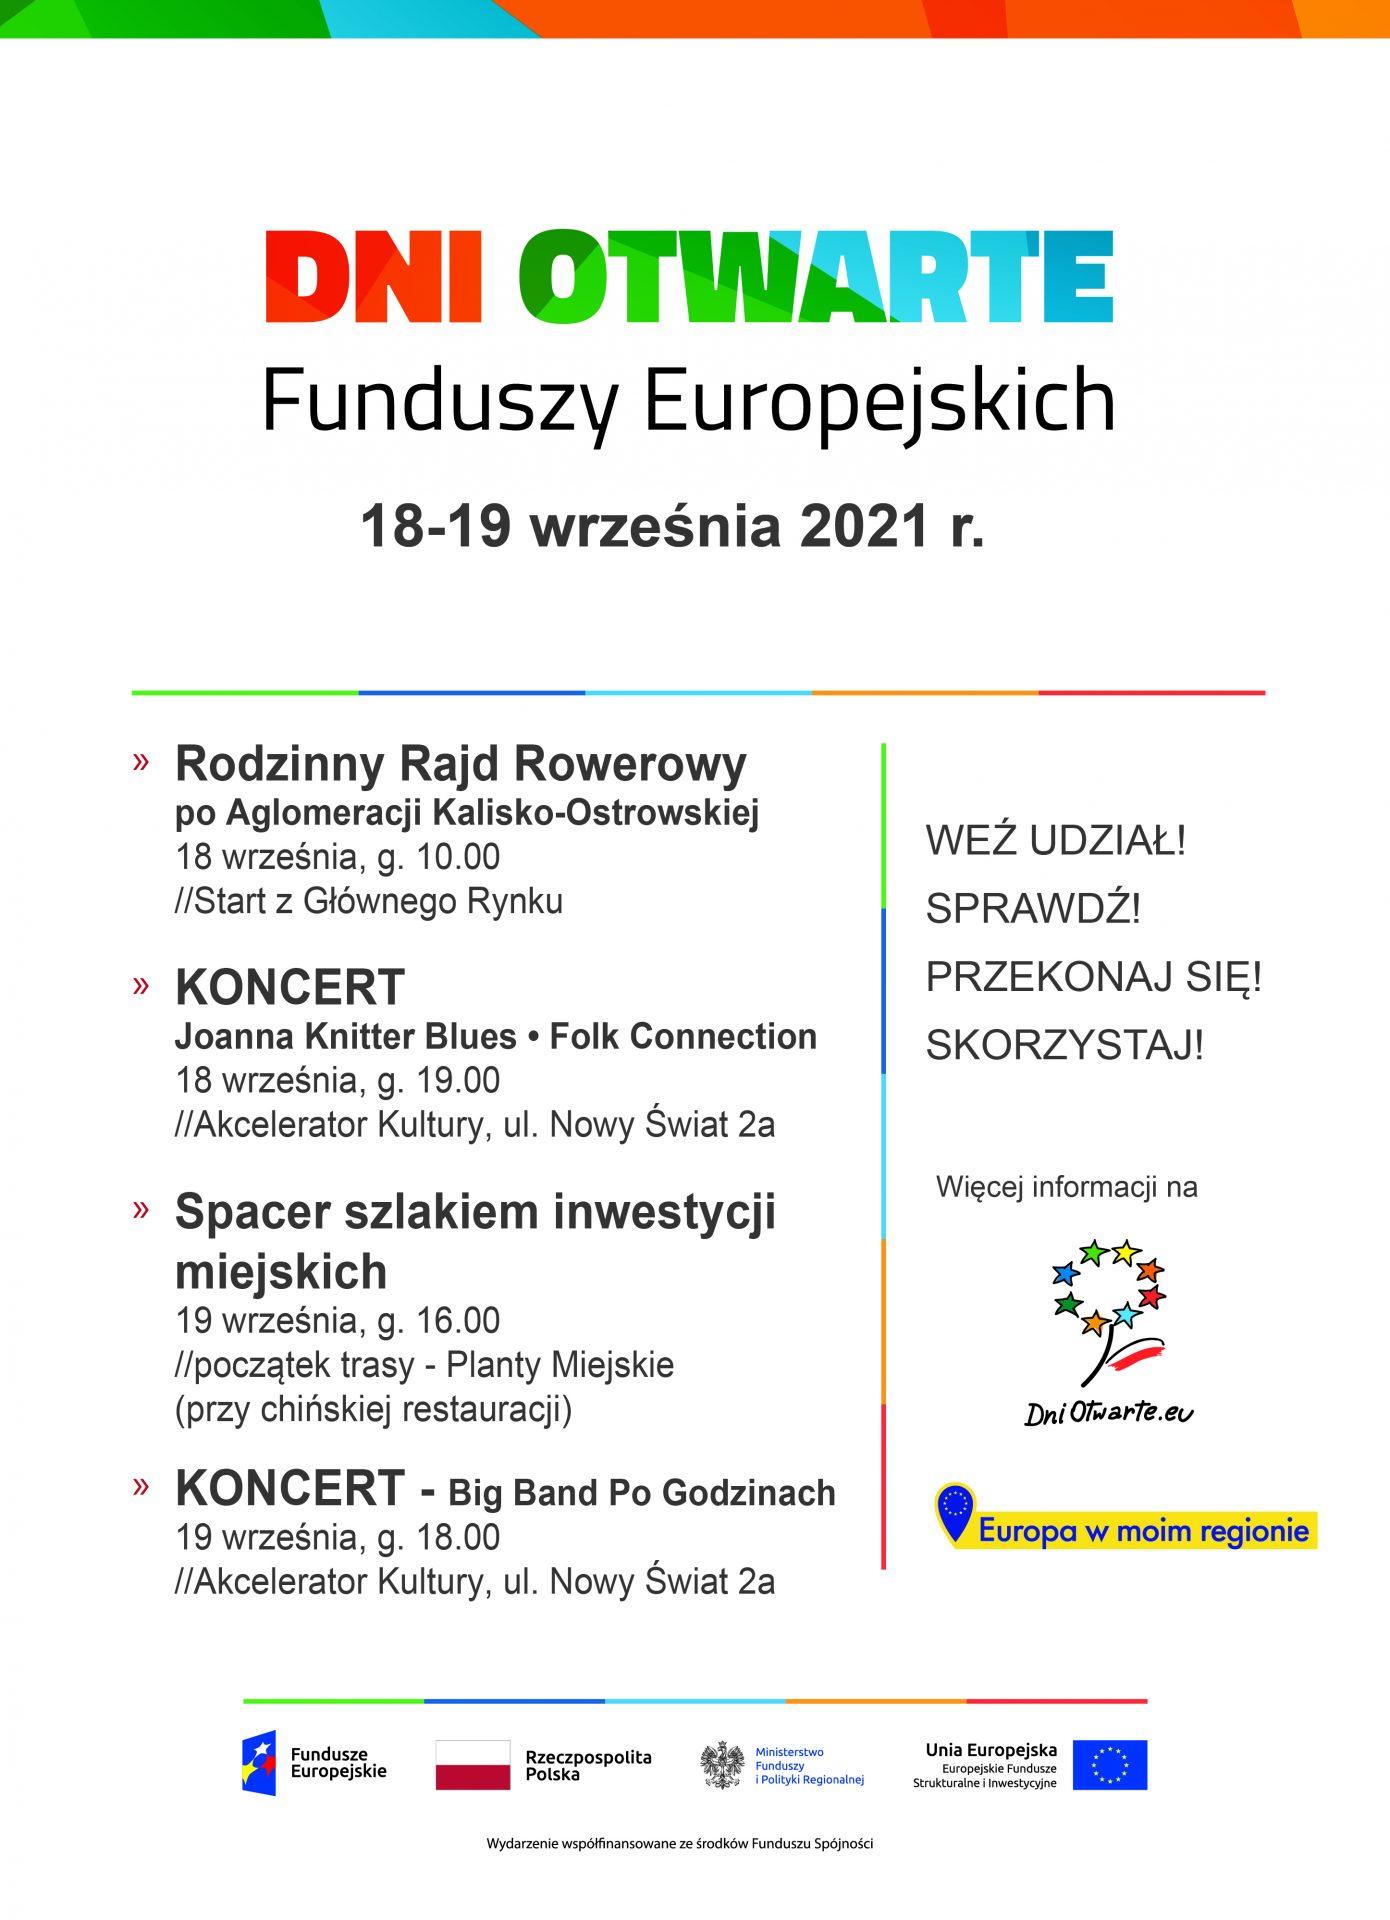 dni otwarte funduszy ue 2021 - DNI OTWARTE FUNDUSZY EUROPEJSKICH